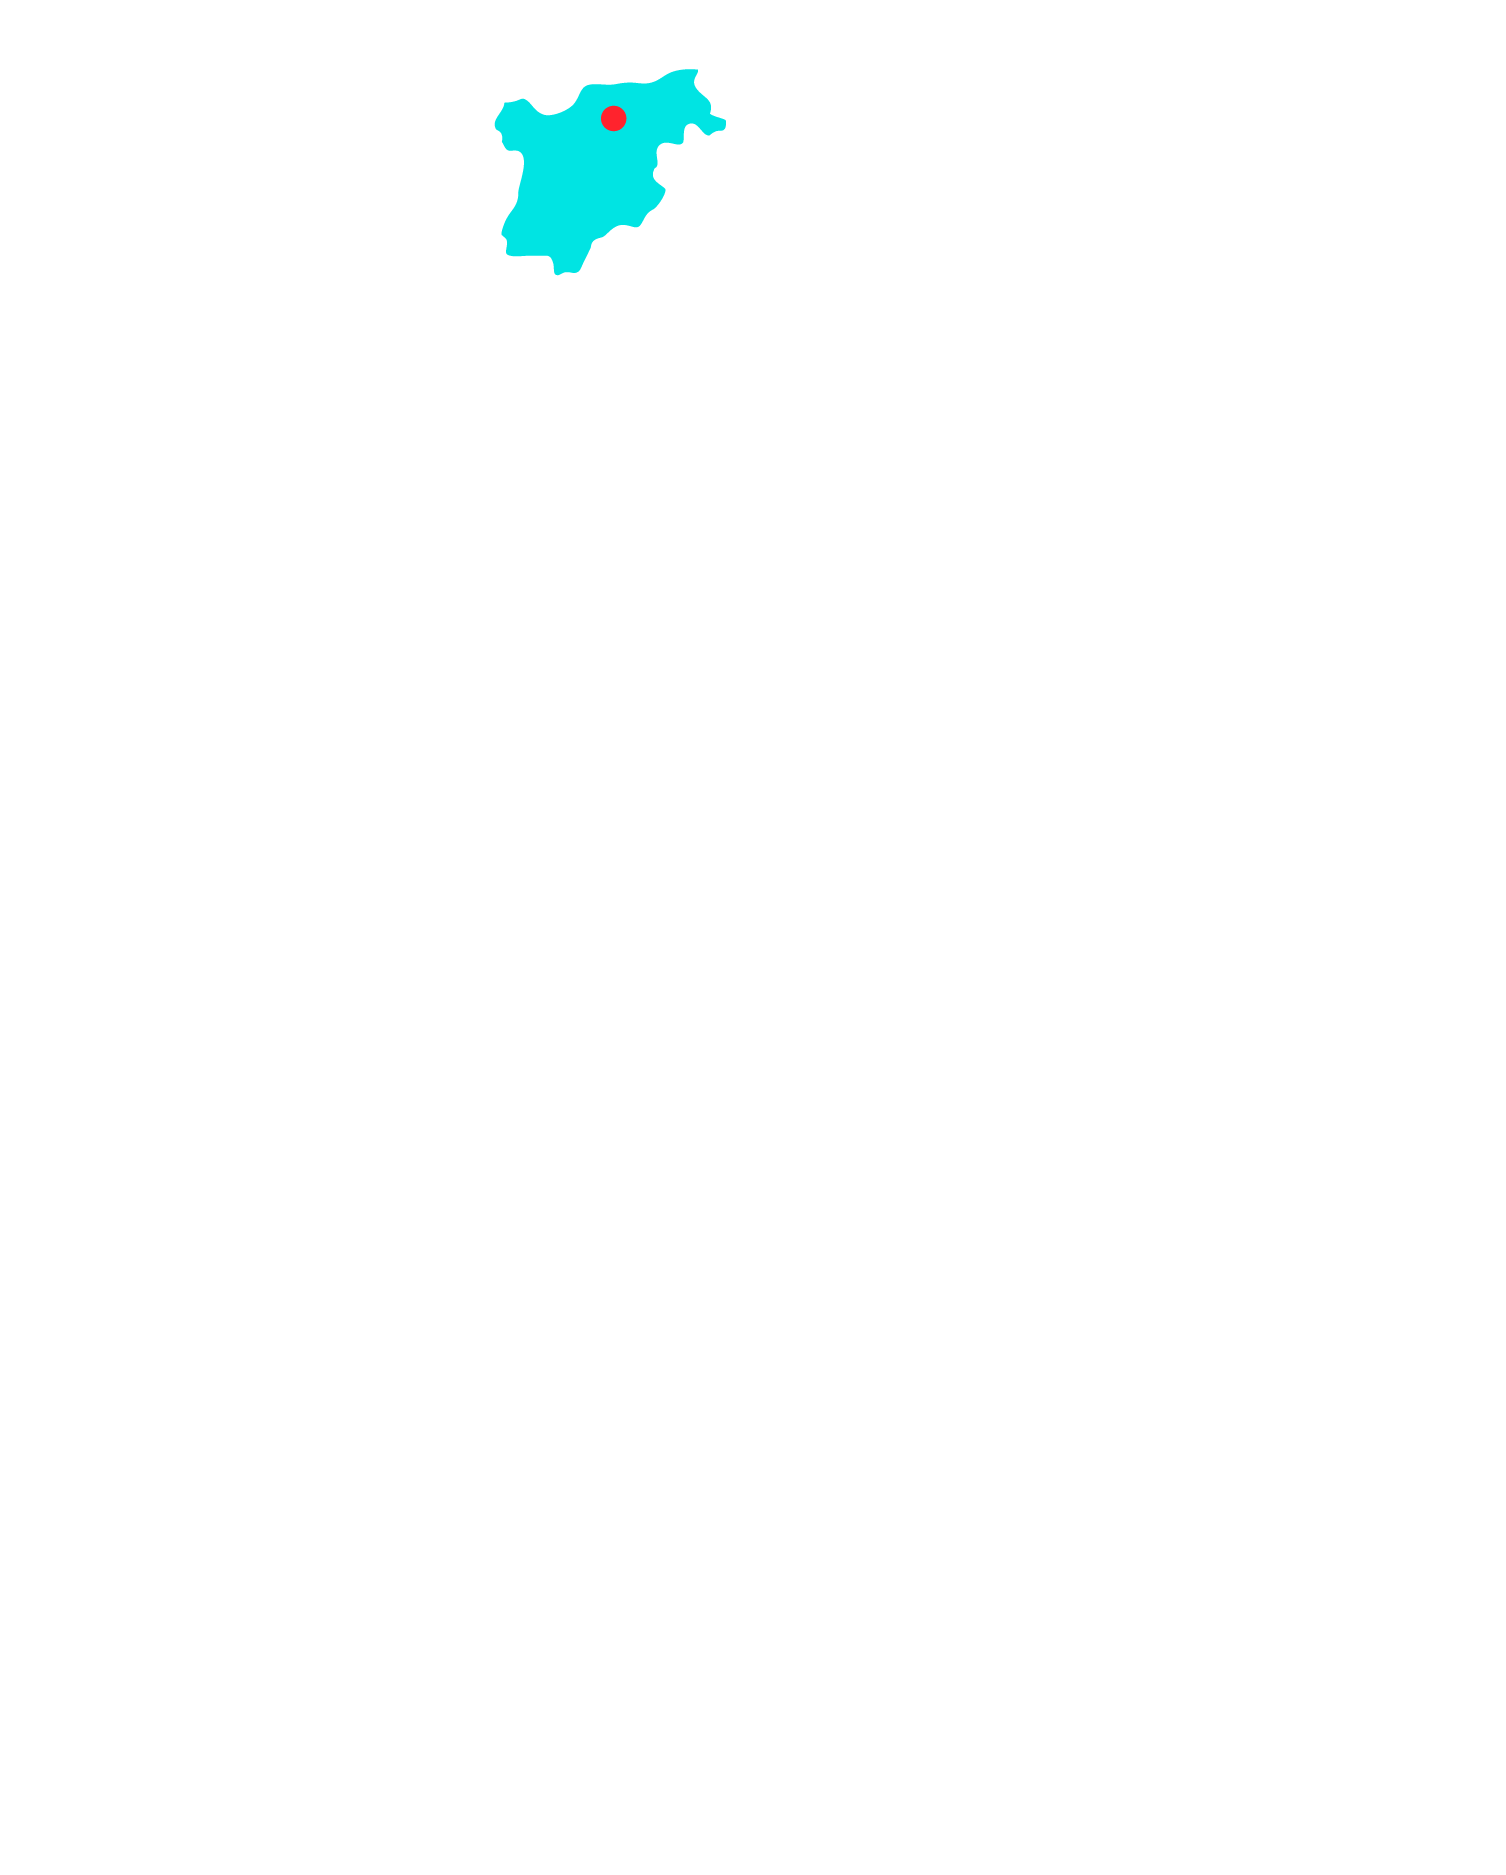 Karte-02